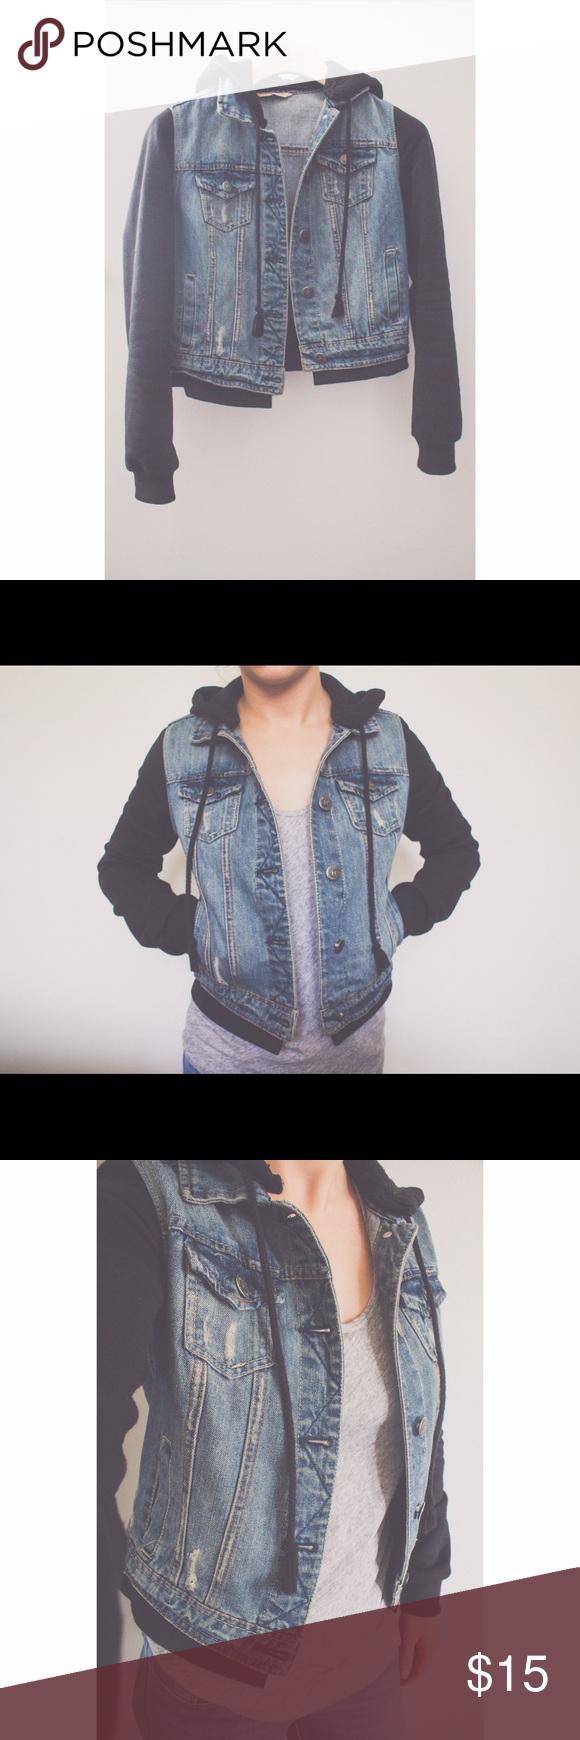 Tilly's hooded jean jacket Denim jacket featuring knit ...